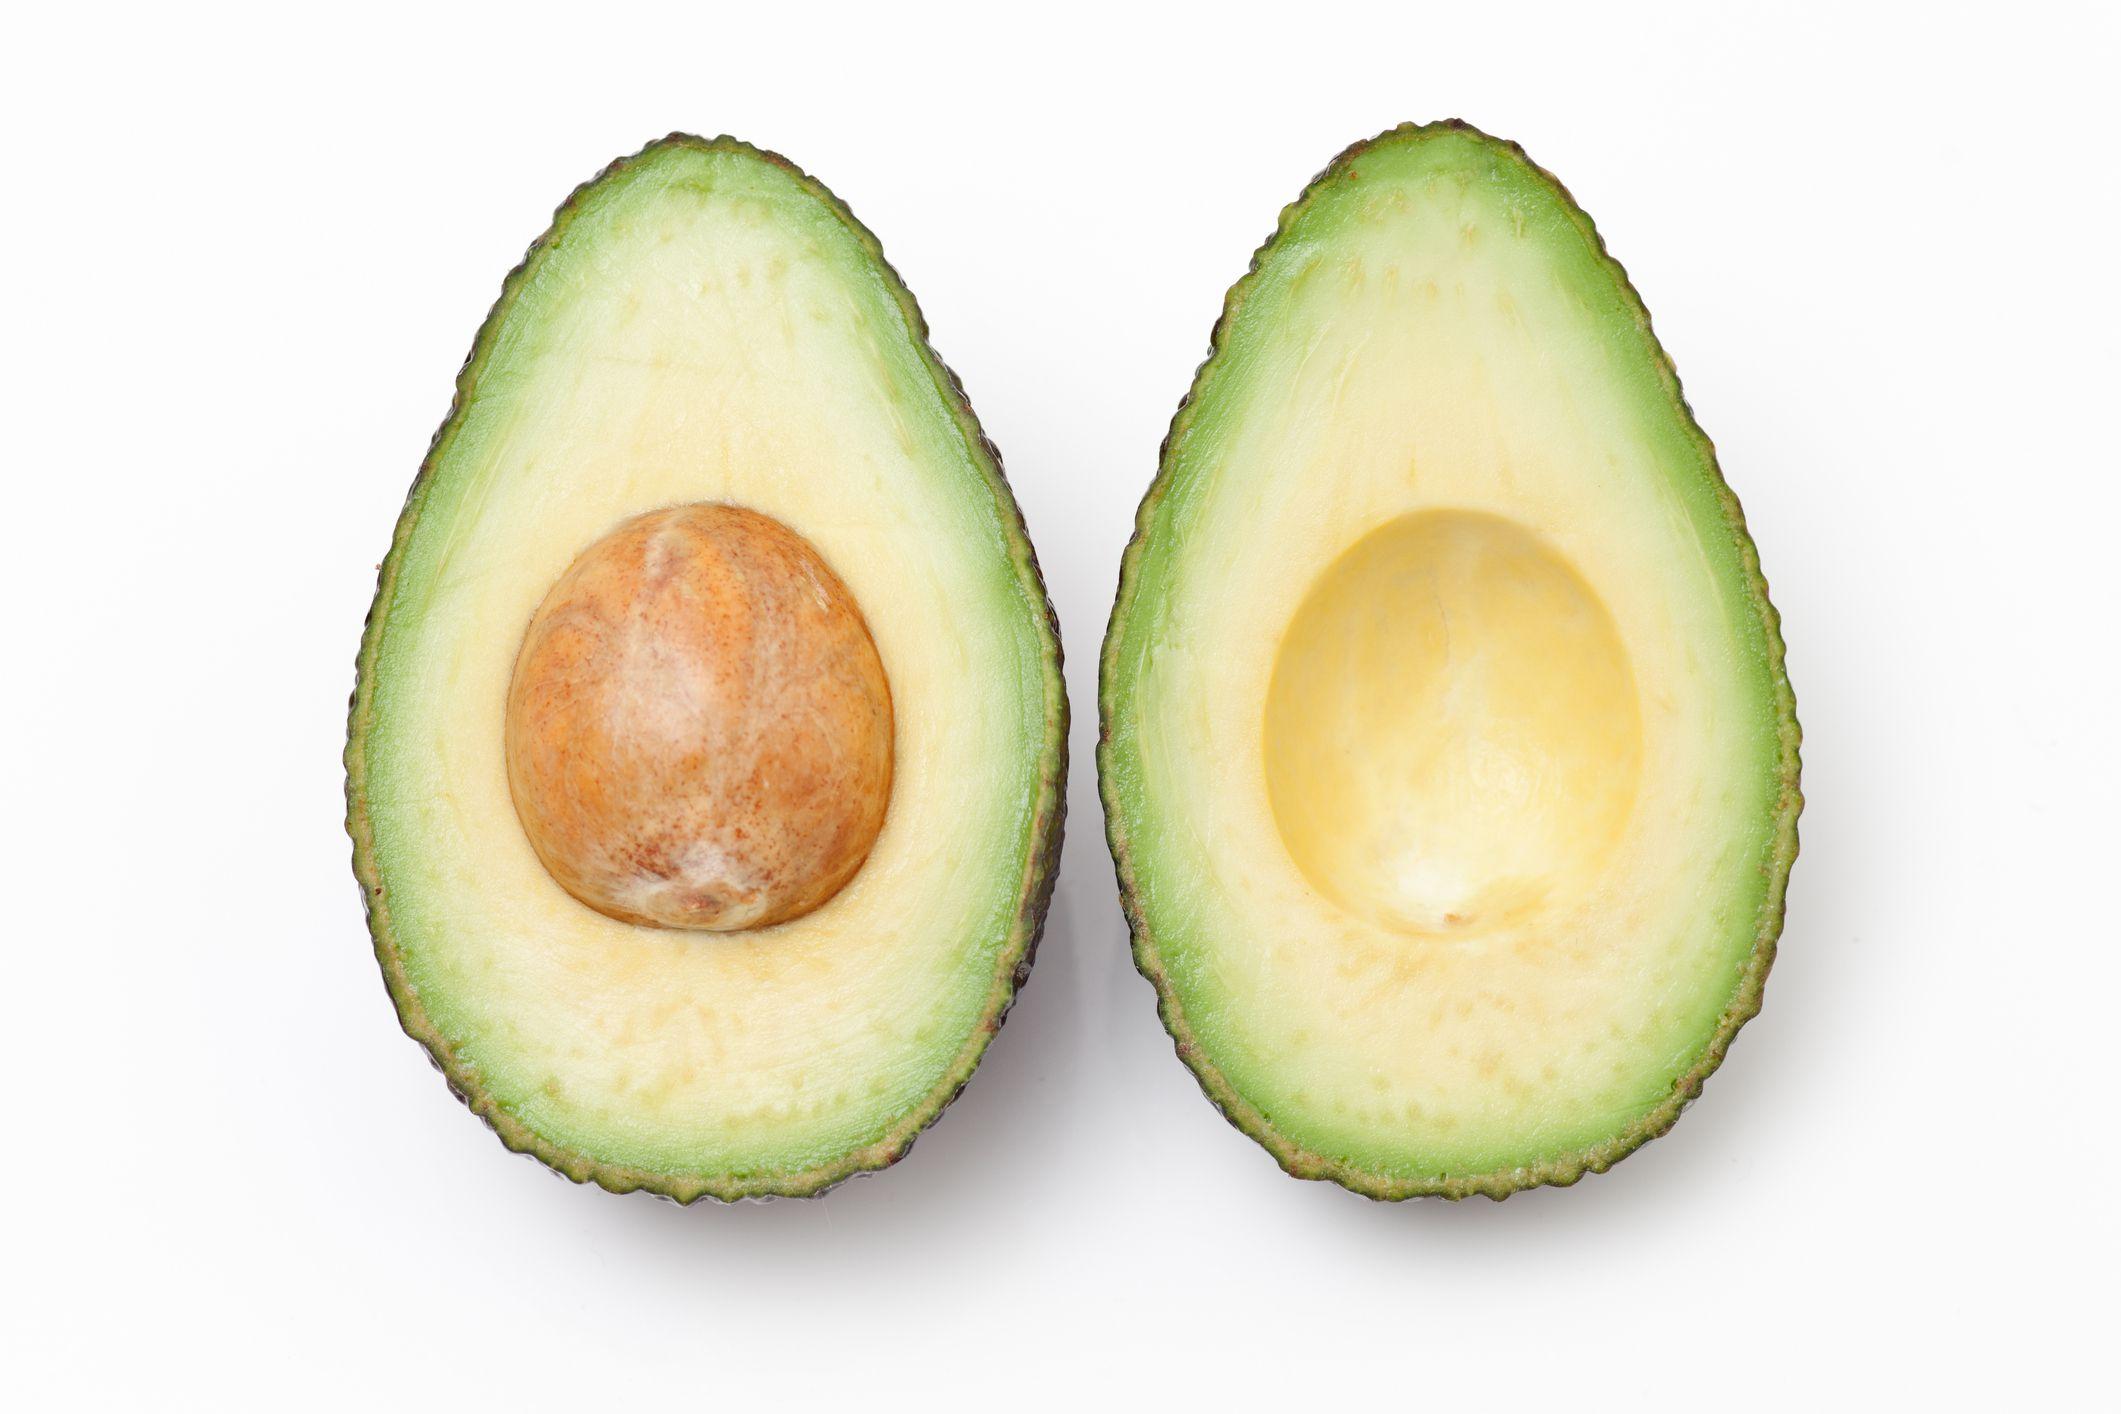 Avocado unsaponifiables